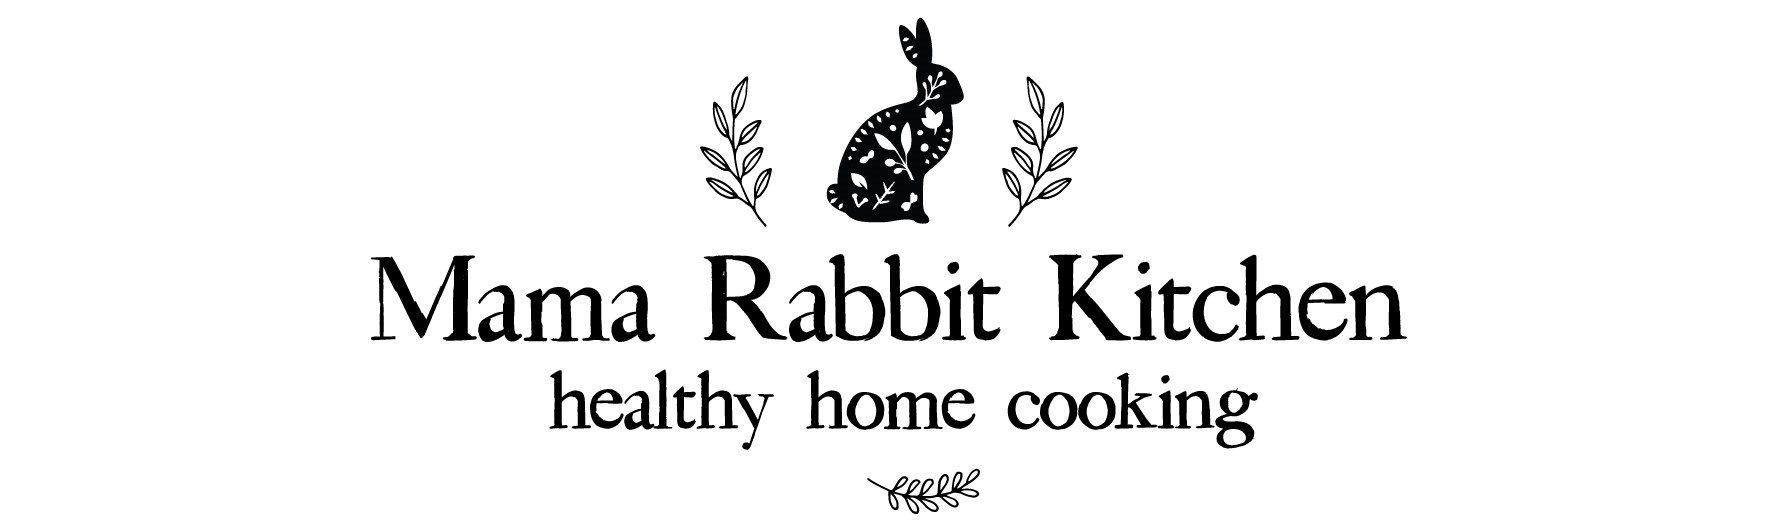 Mama Rabbit Kitchen